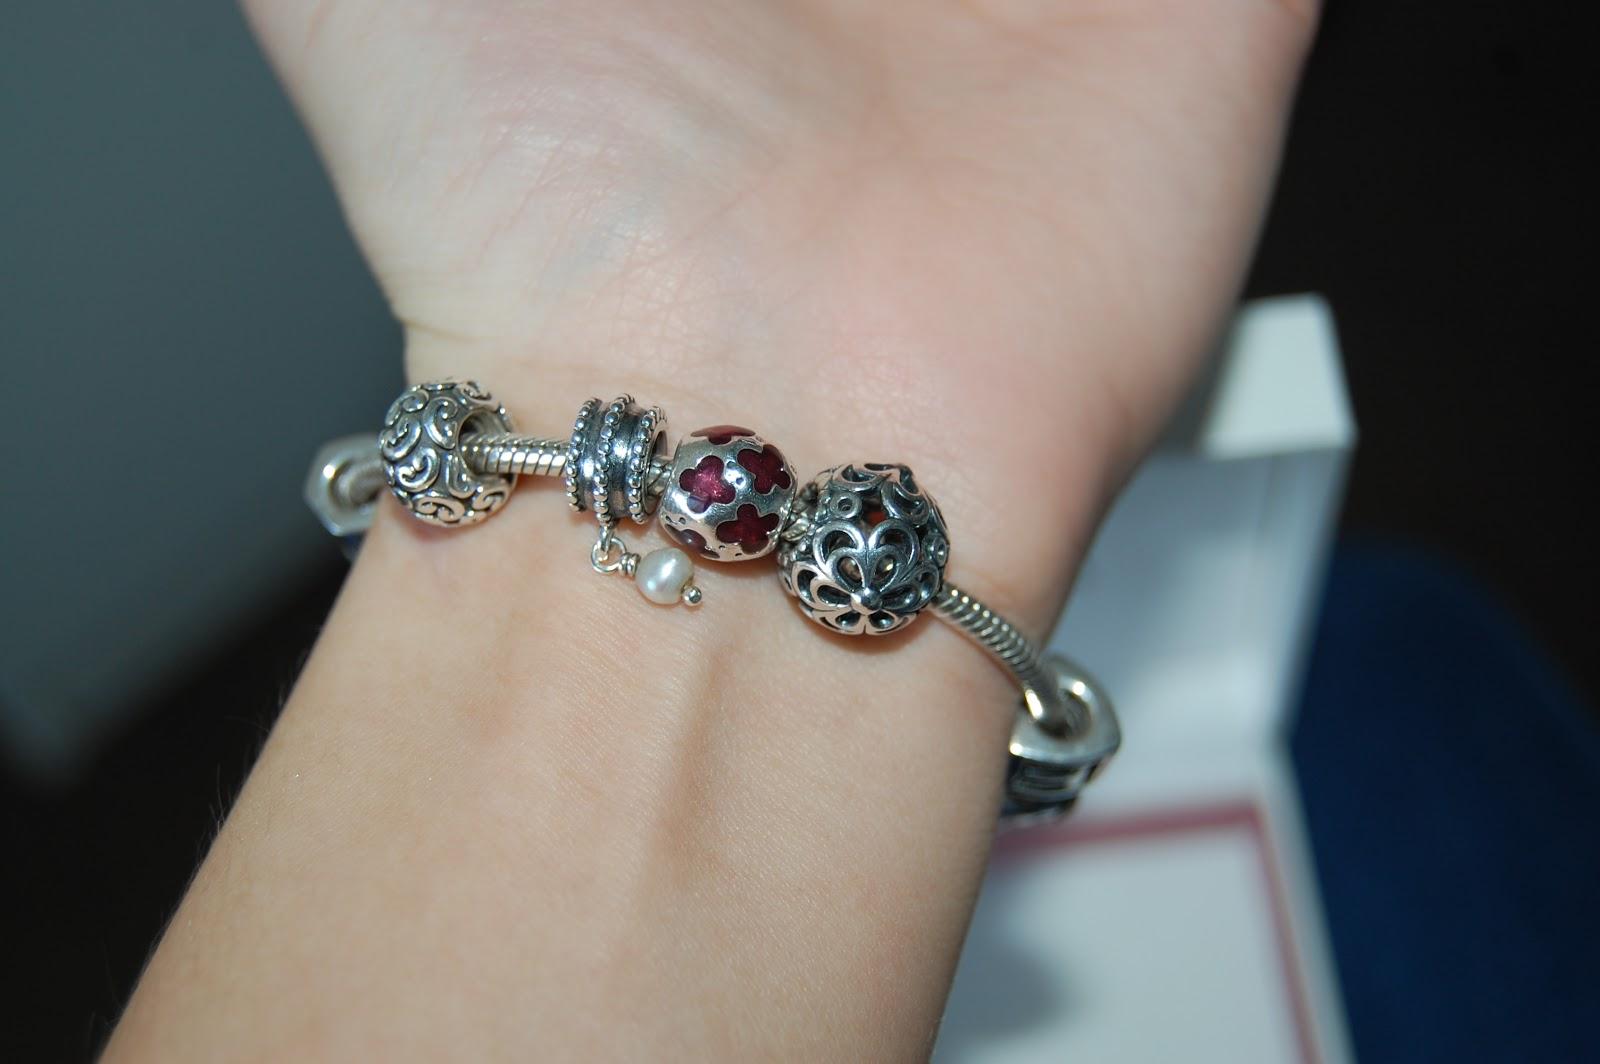 bracelet on wrist - photo #7